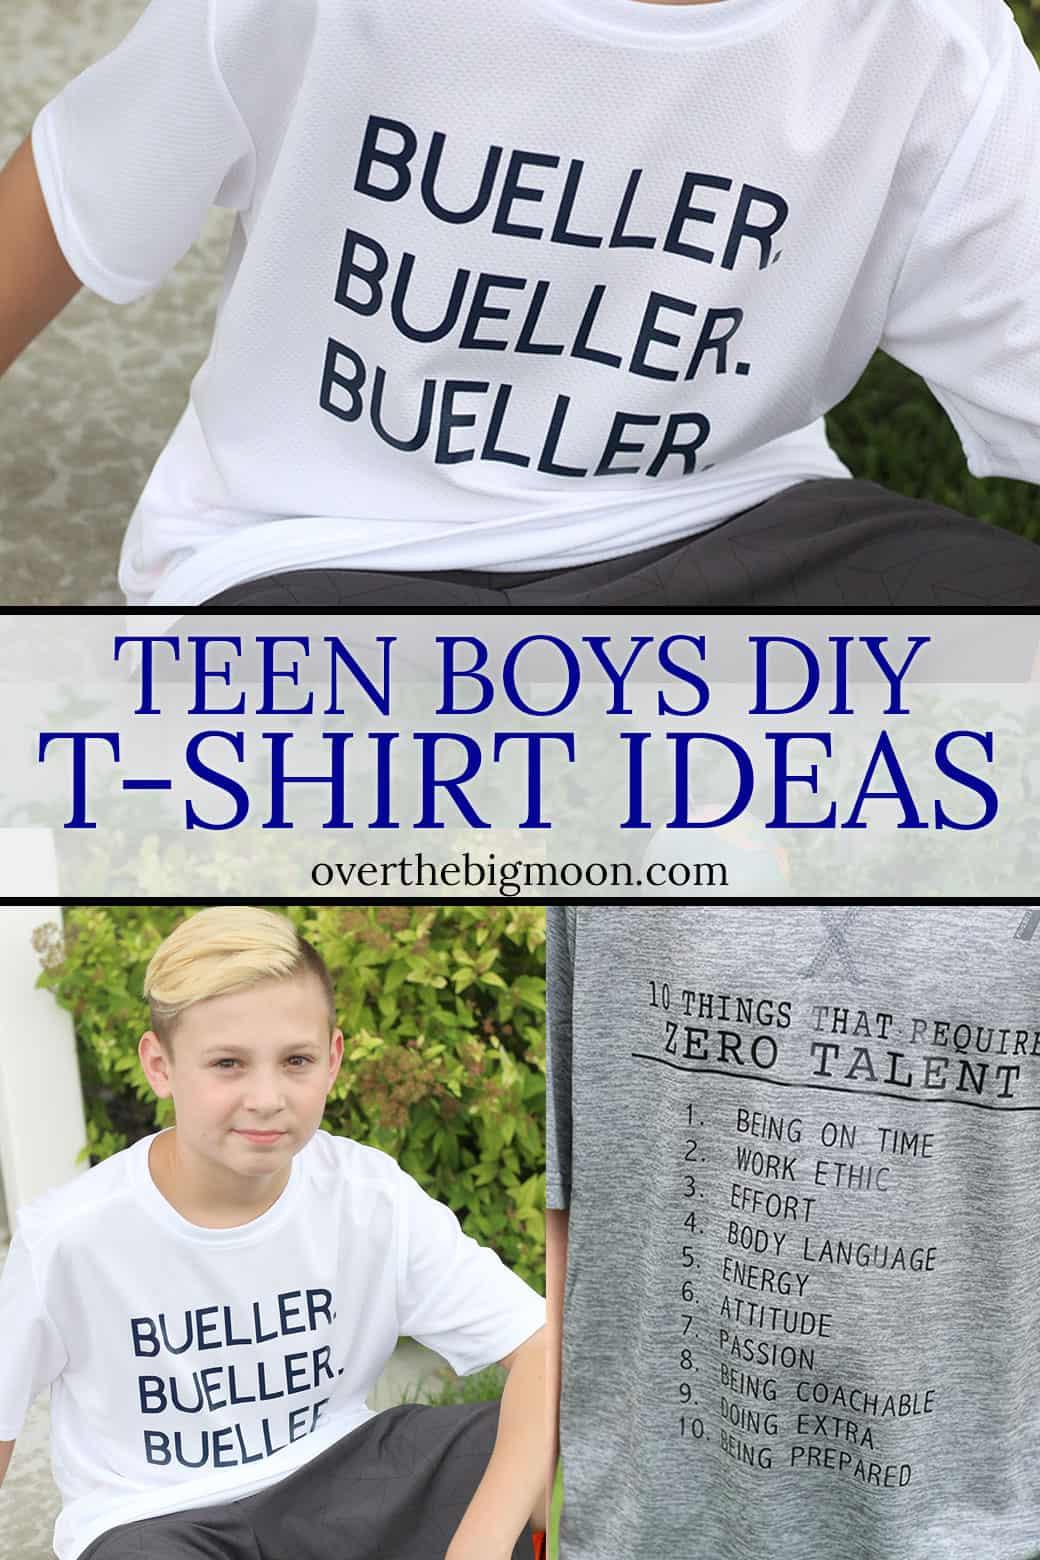 Teen Boys DIY Shirt Ideas for Iron On - www.overthebigmoon.com!